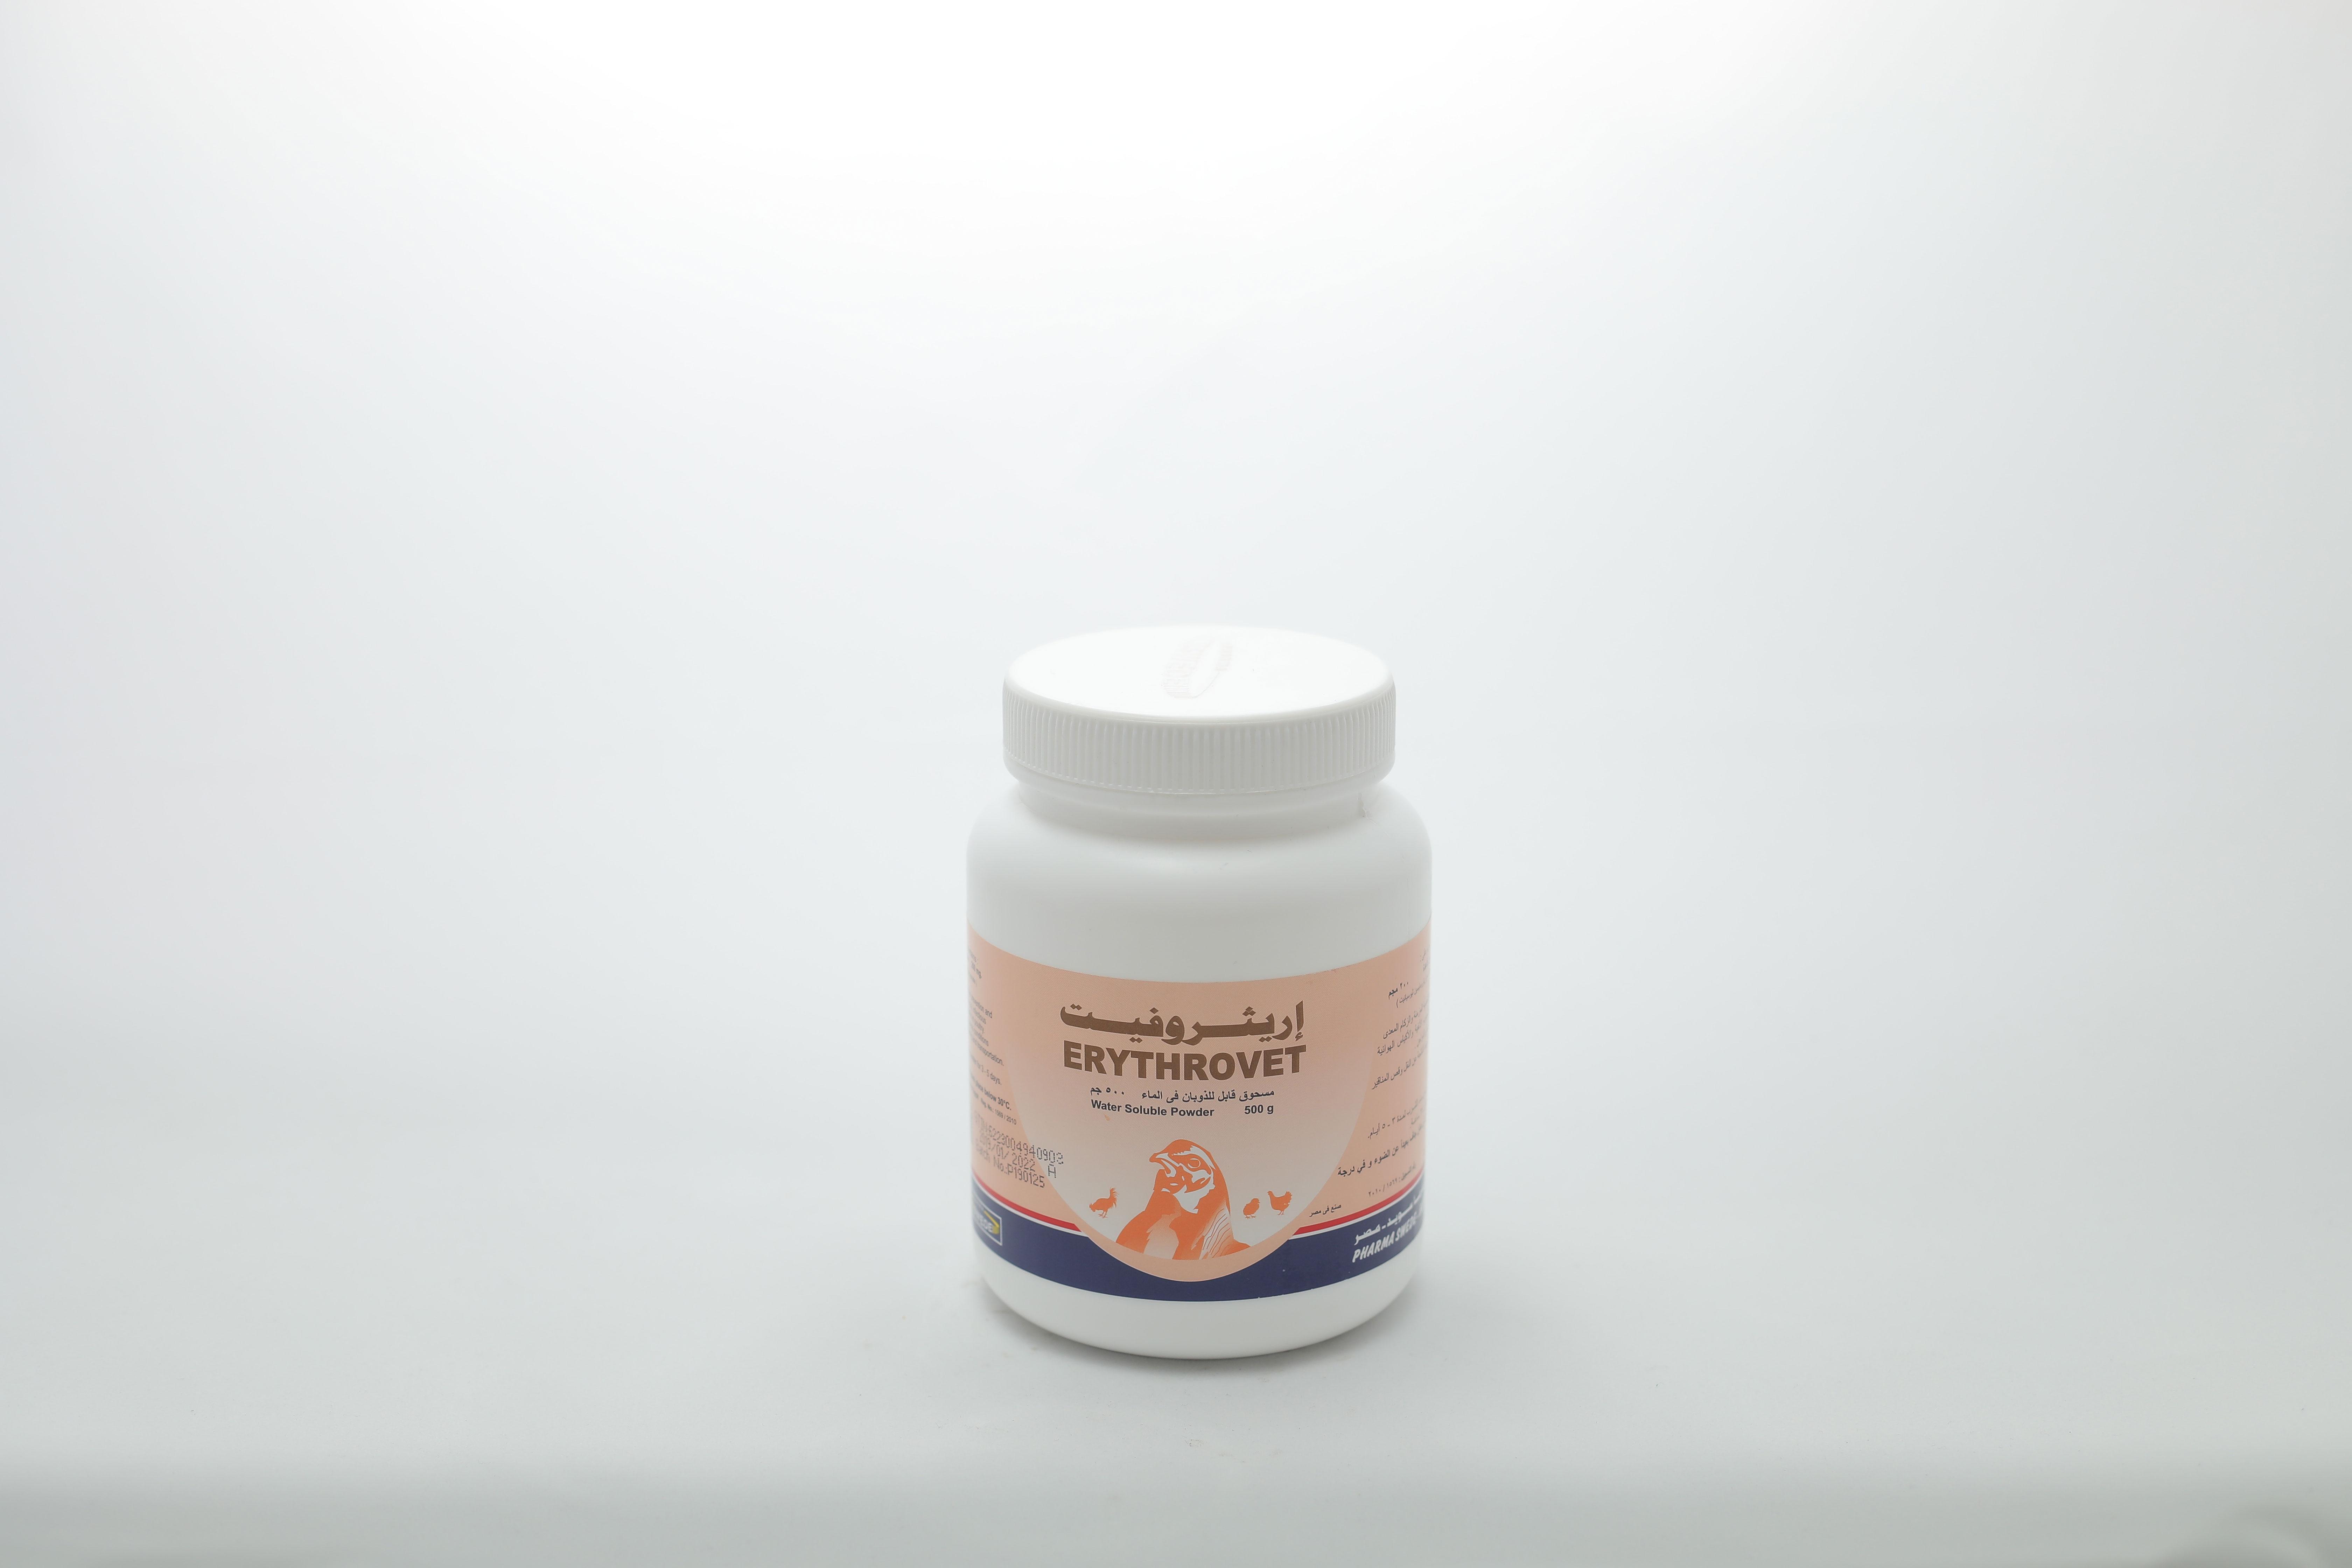 Erythrovet WSP